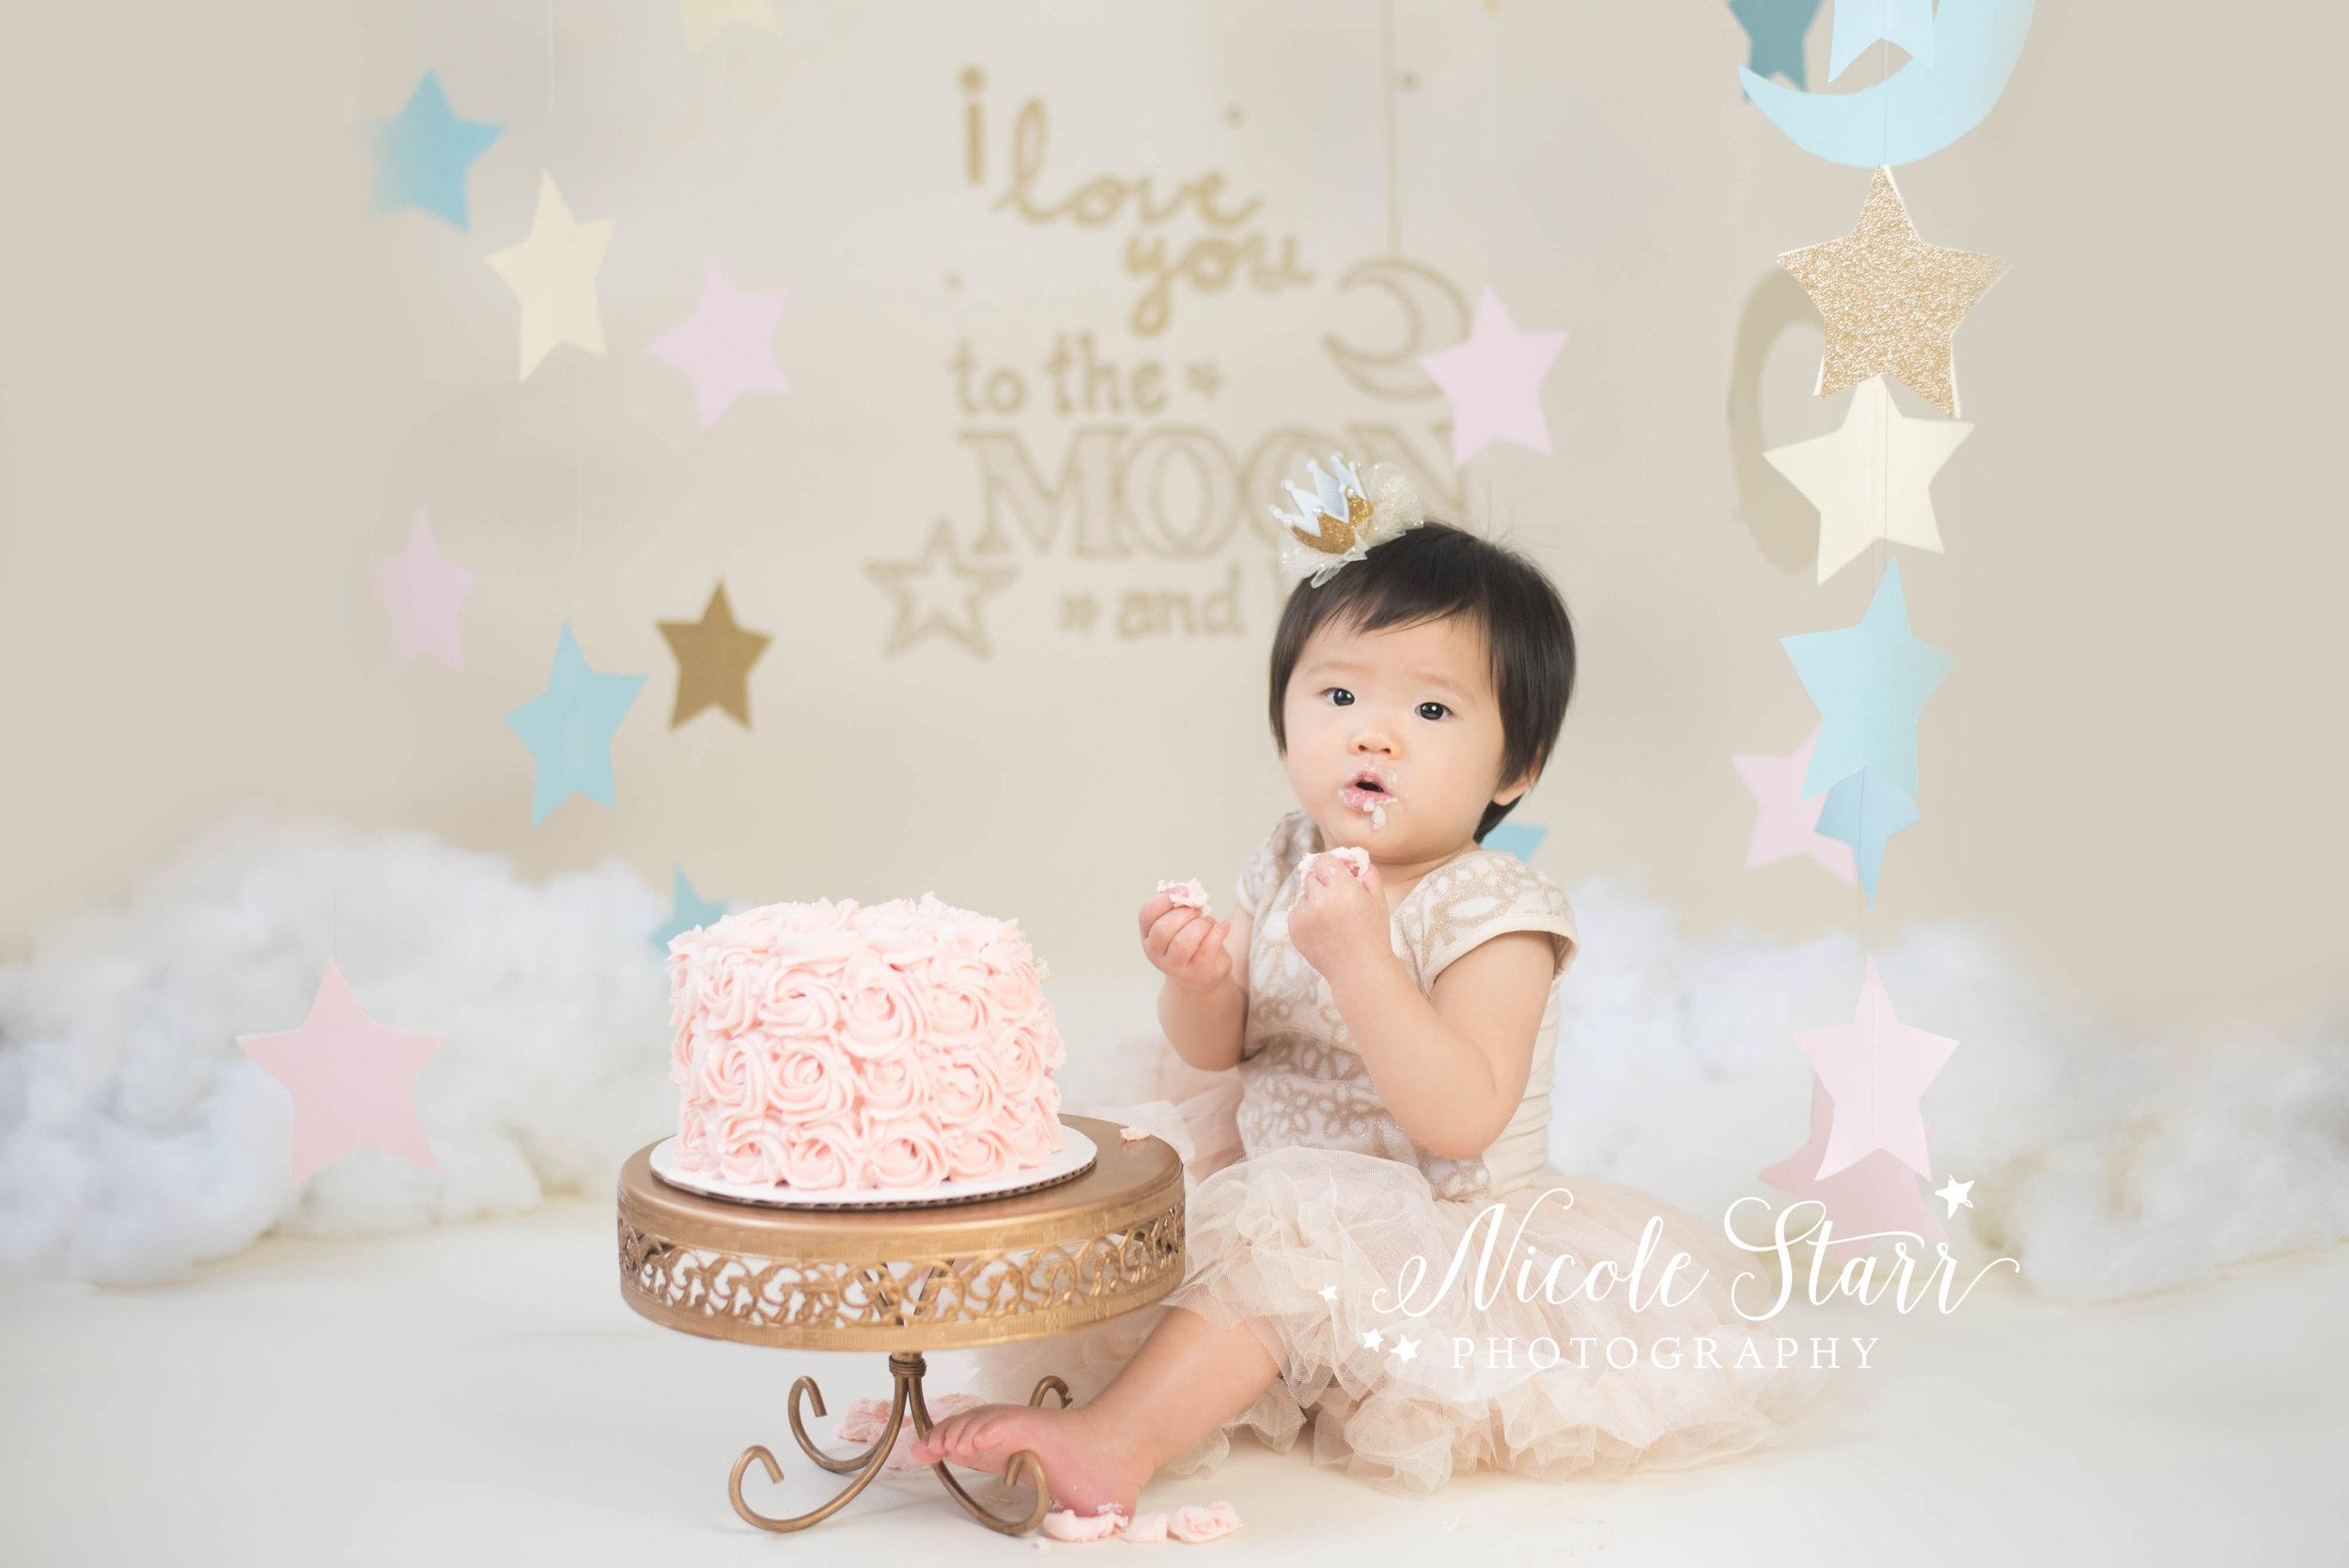 saratoga springs cake smash baby photographer, boston cake smash baby photographer